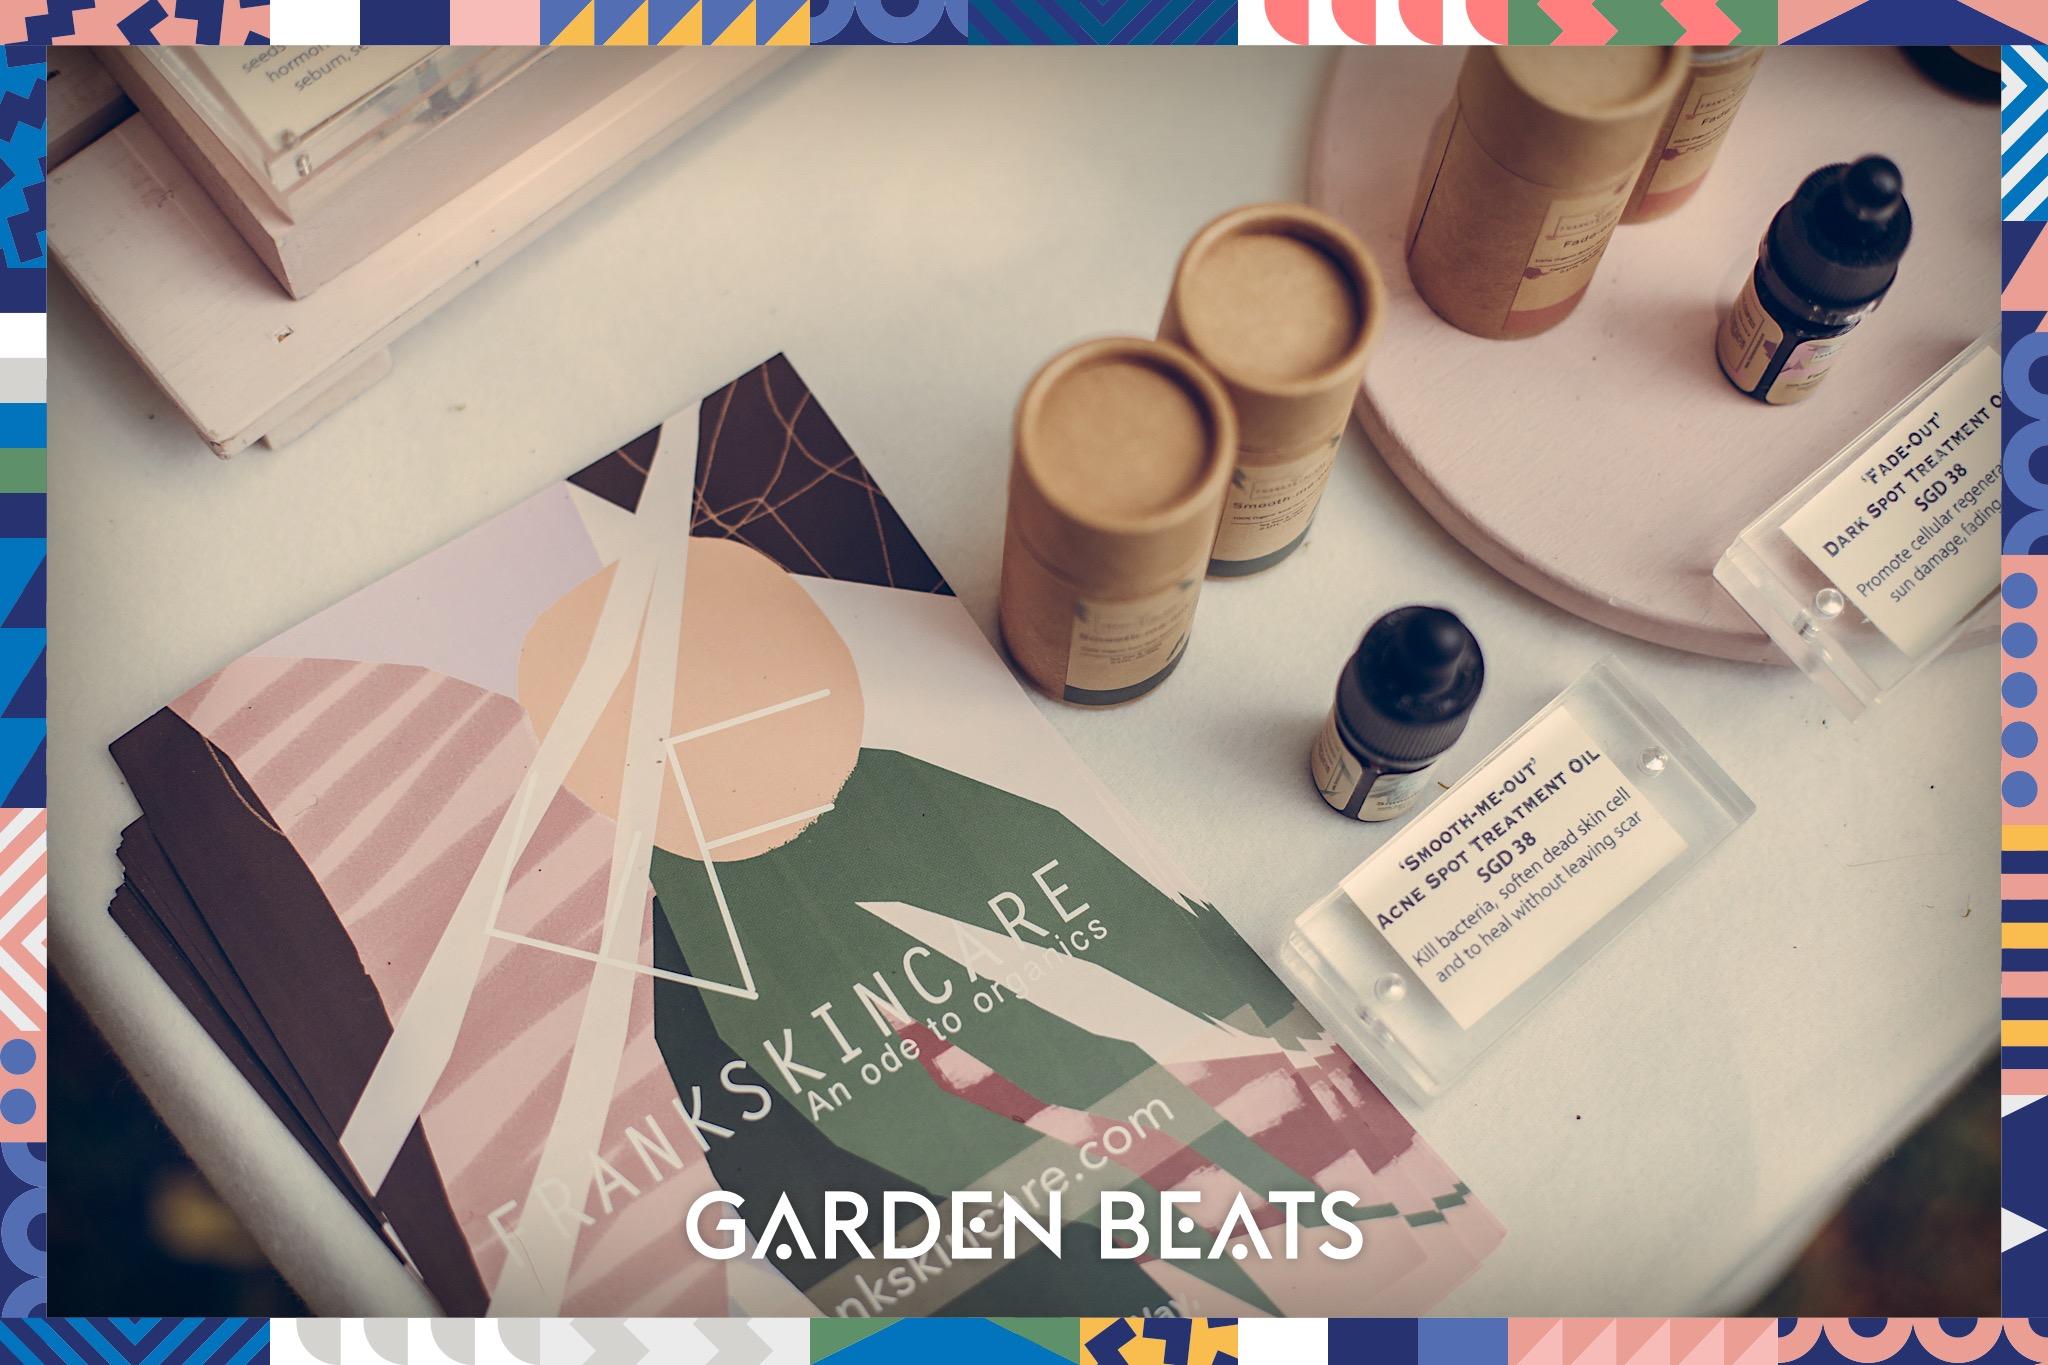 03032018_GardenBeats_Colossal125_Watermarked.jpg